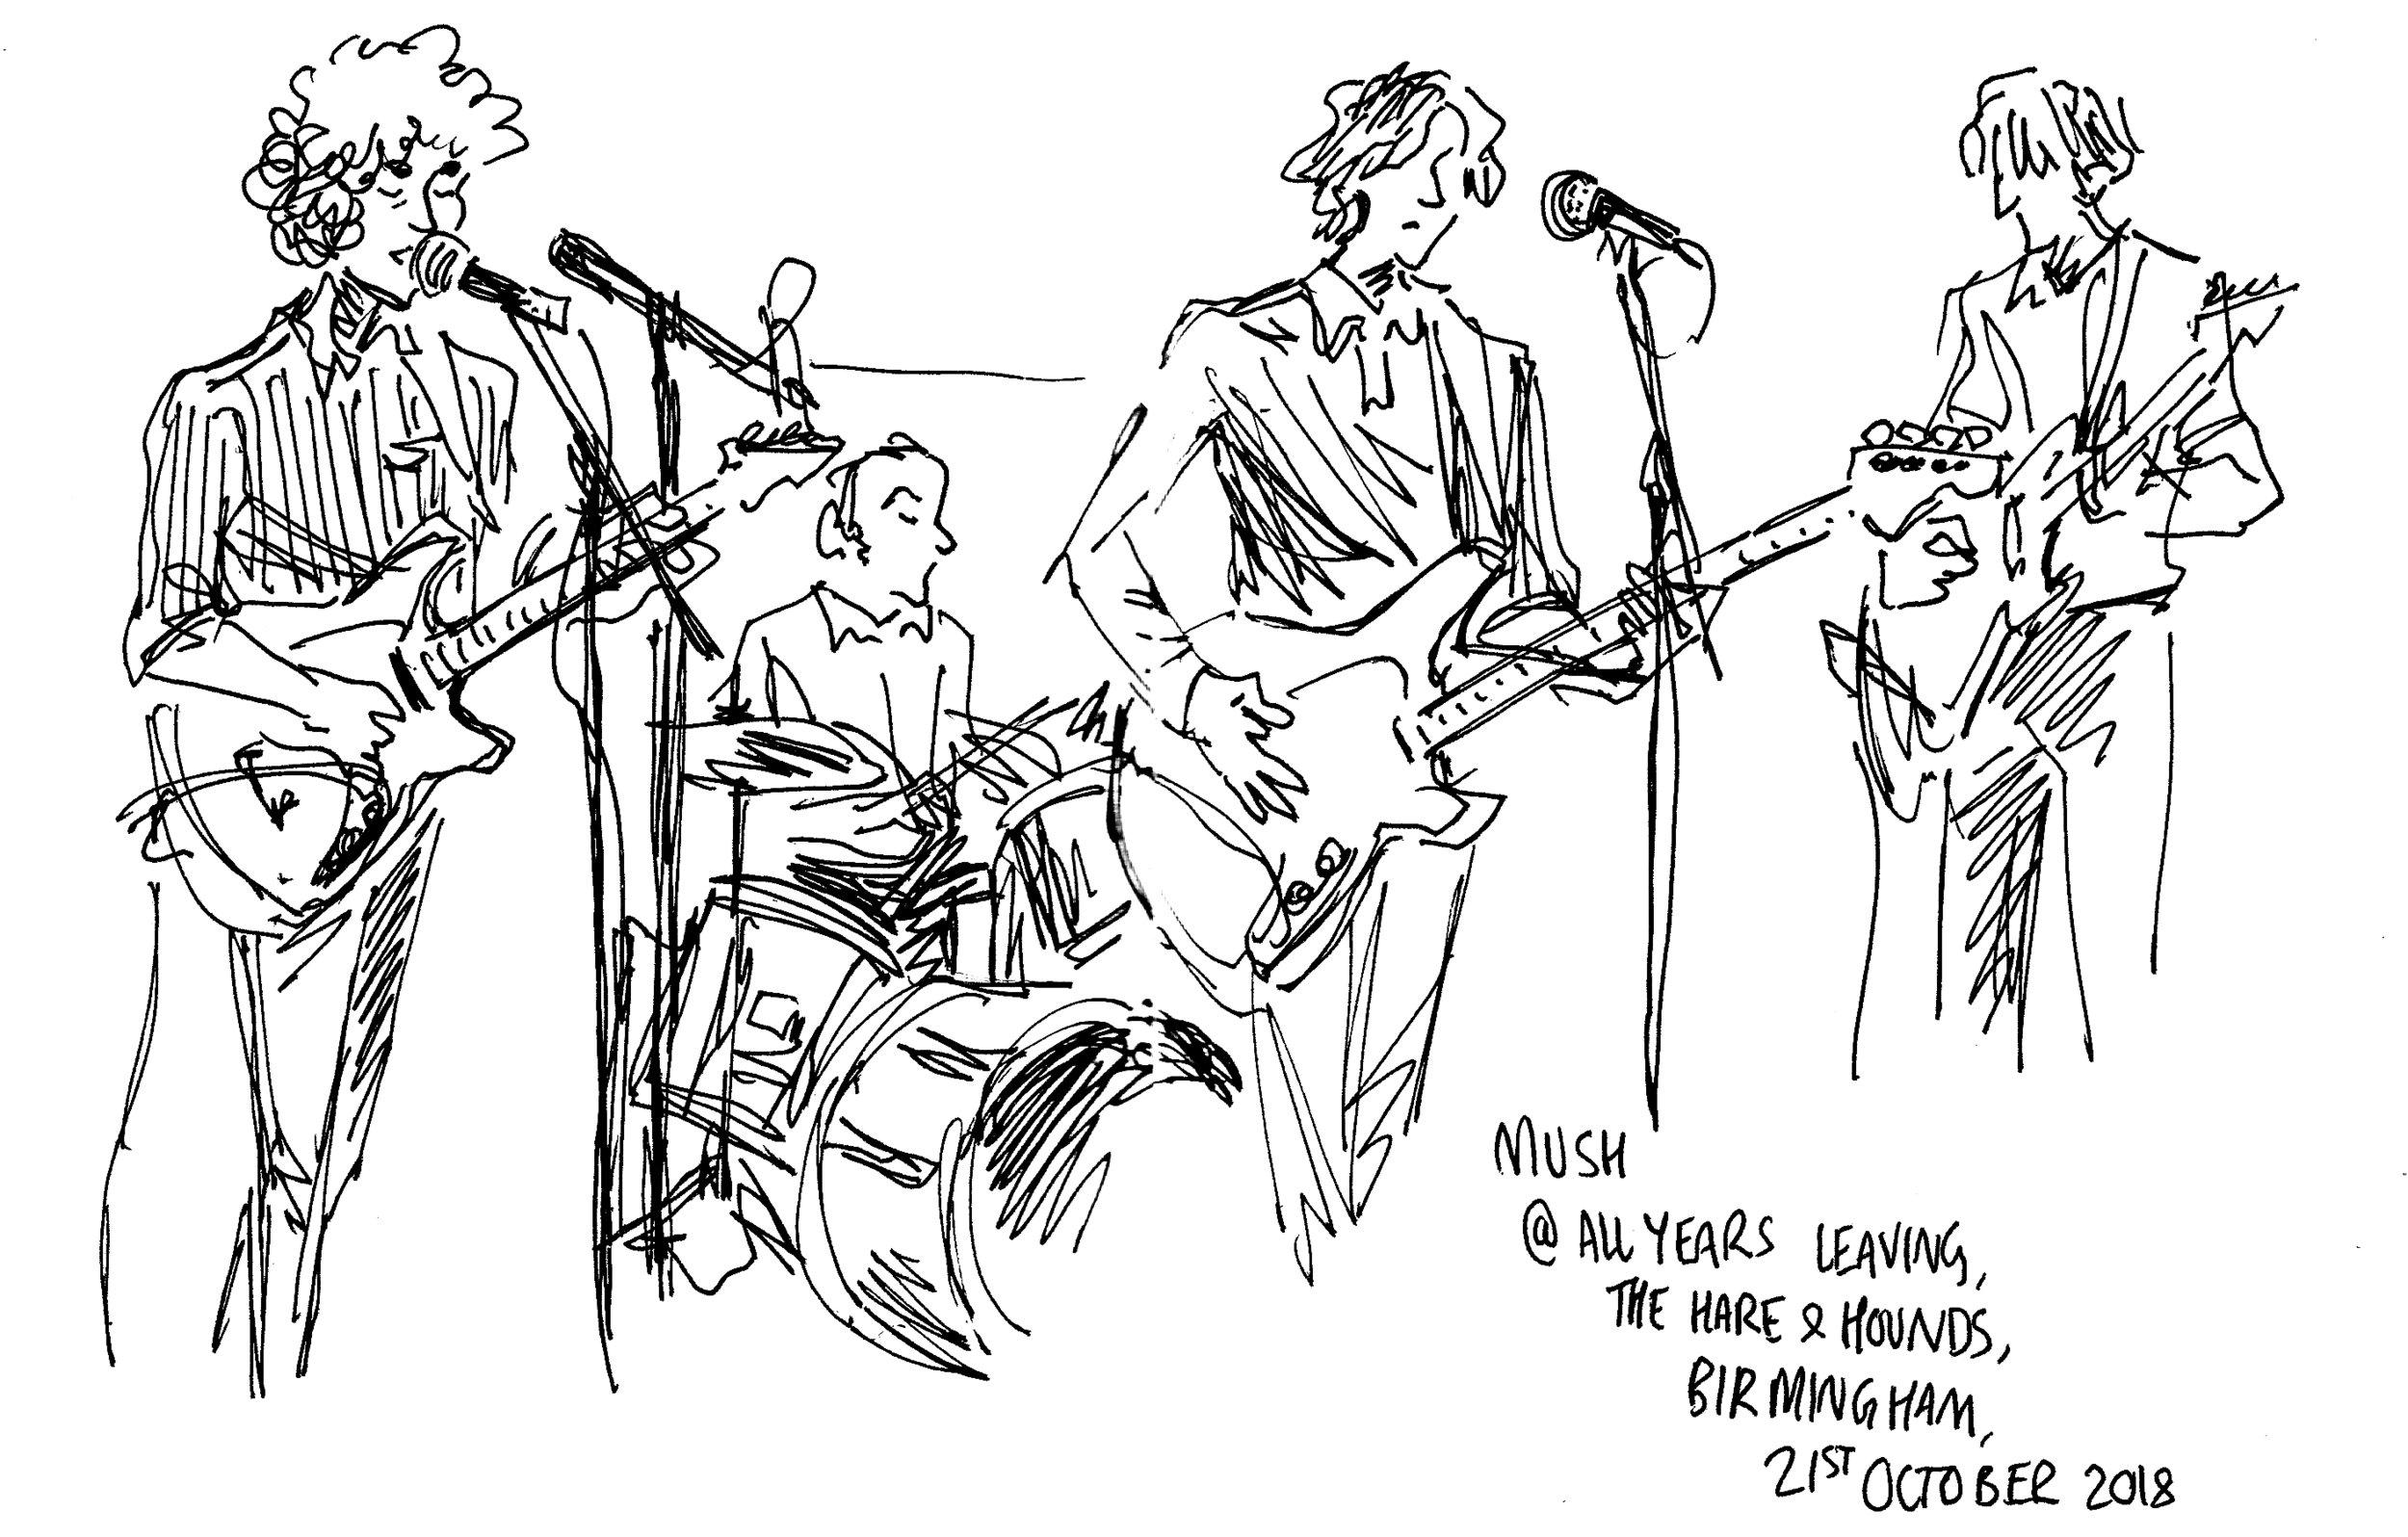 gig sketches (271).jpg